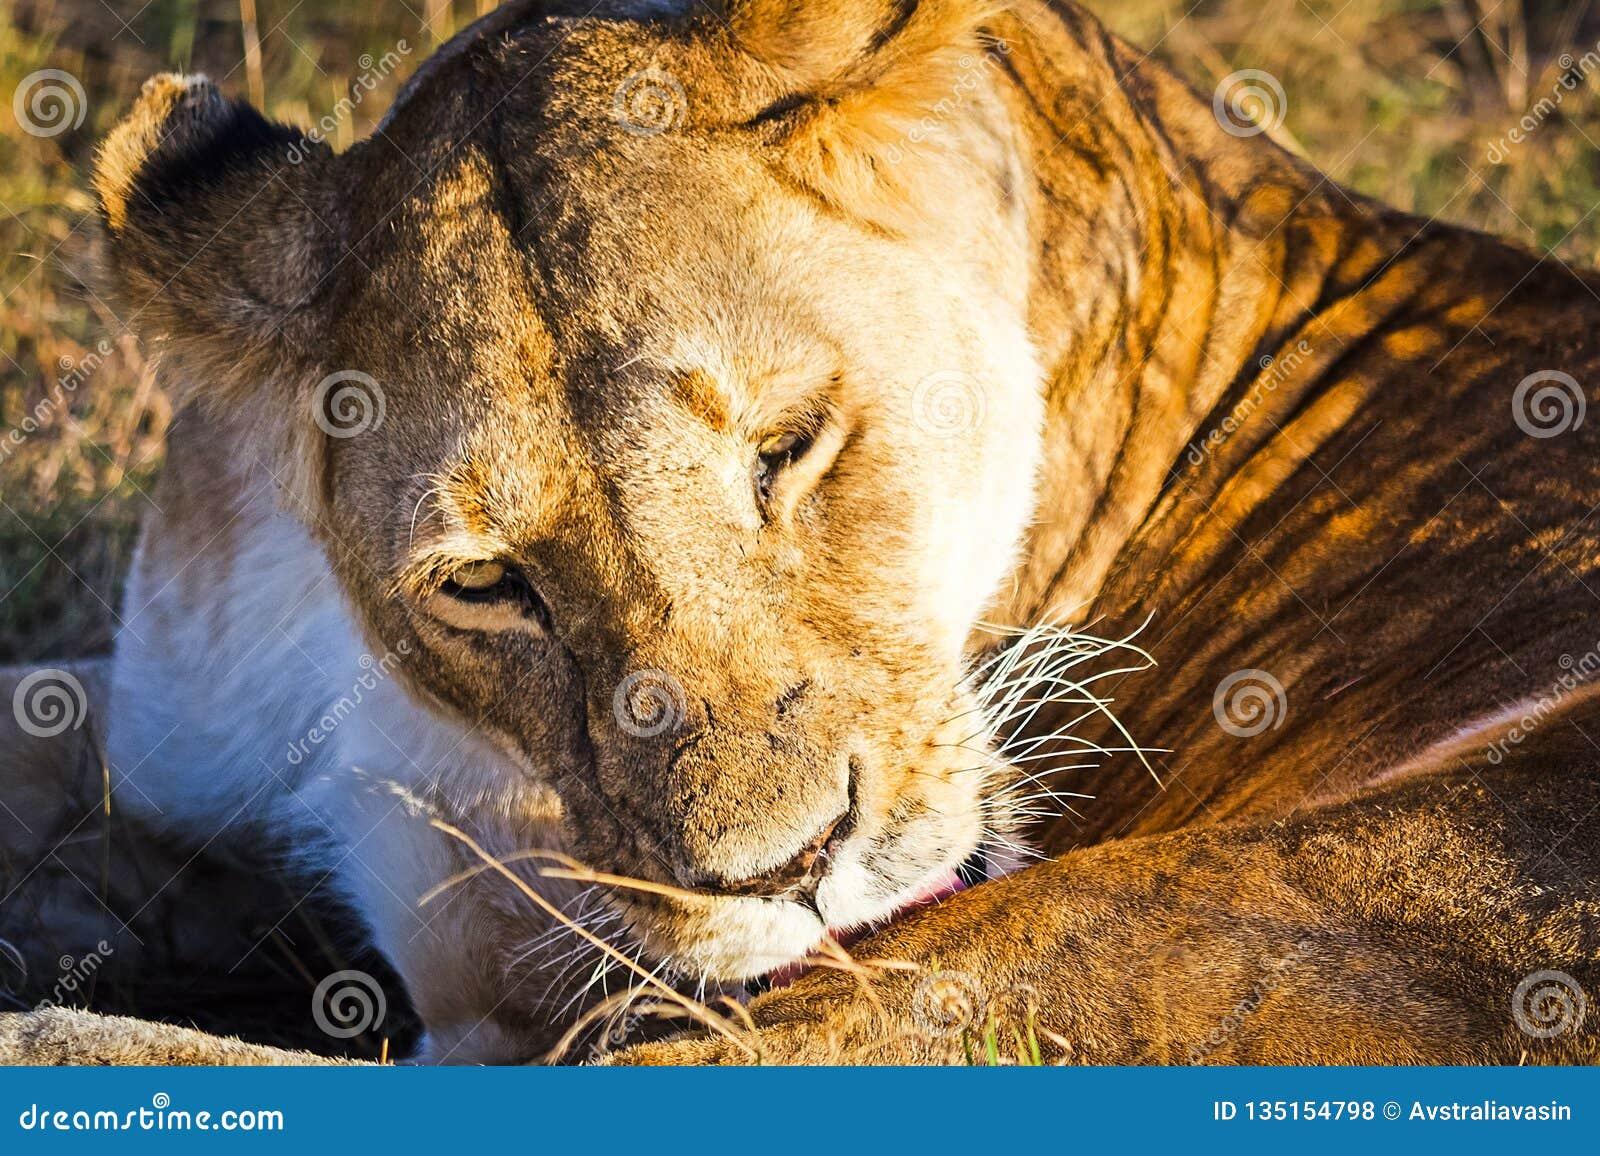 Lion in the wild in the African . Lion - predator felines